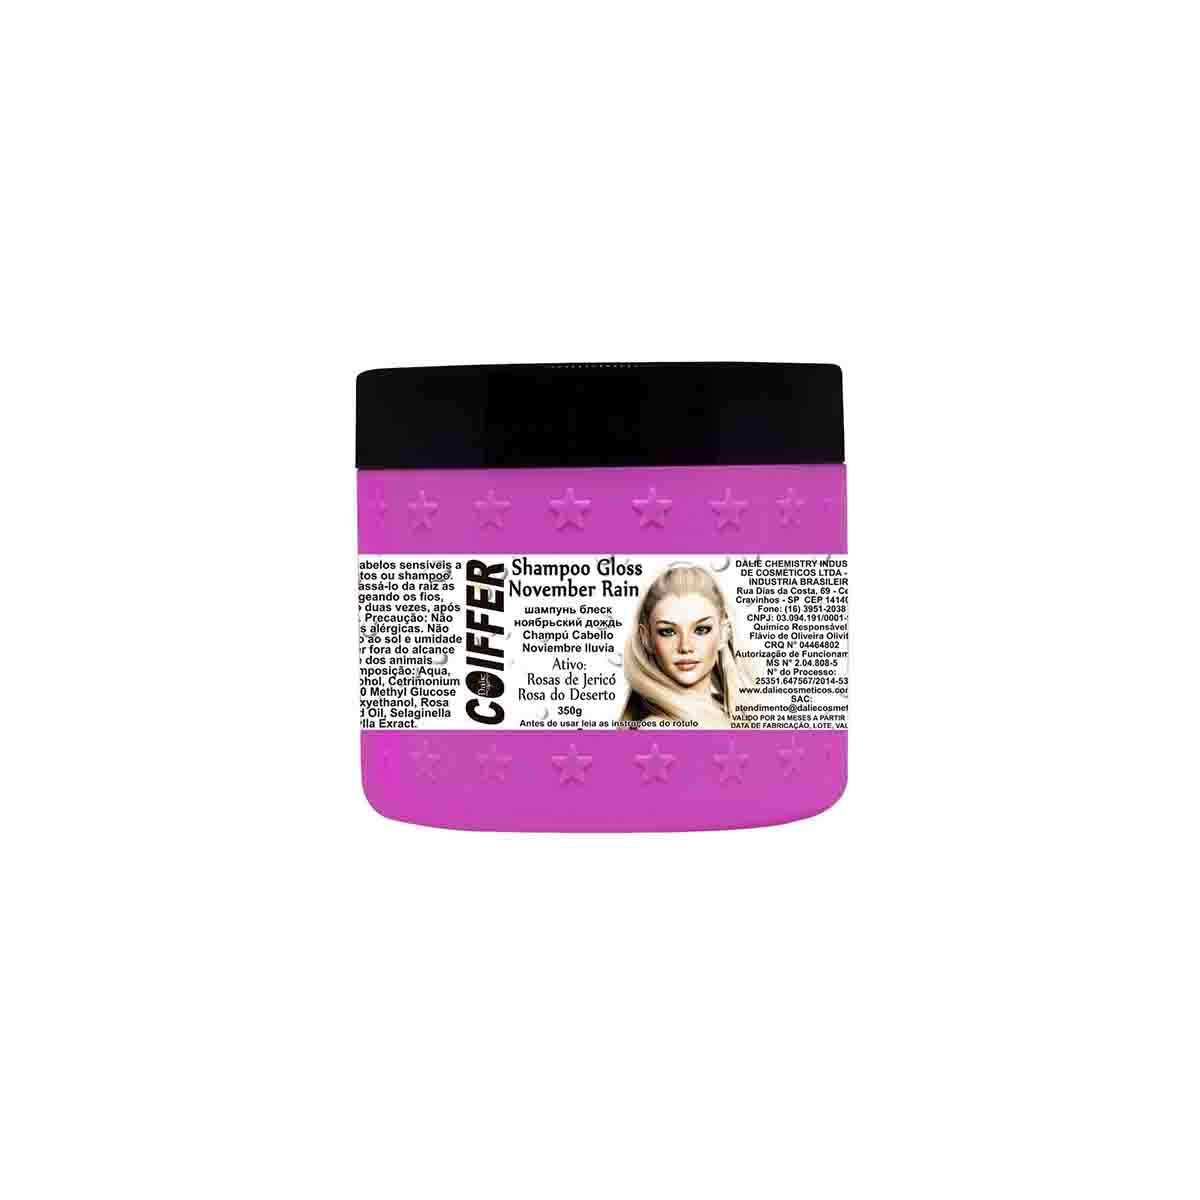 Shampoo para Cabelos  Gloss November Rain Coiffer 350g